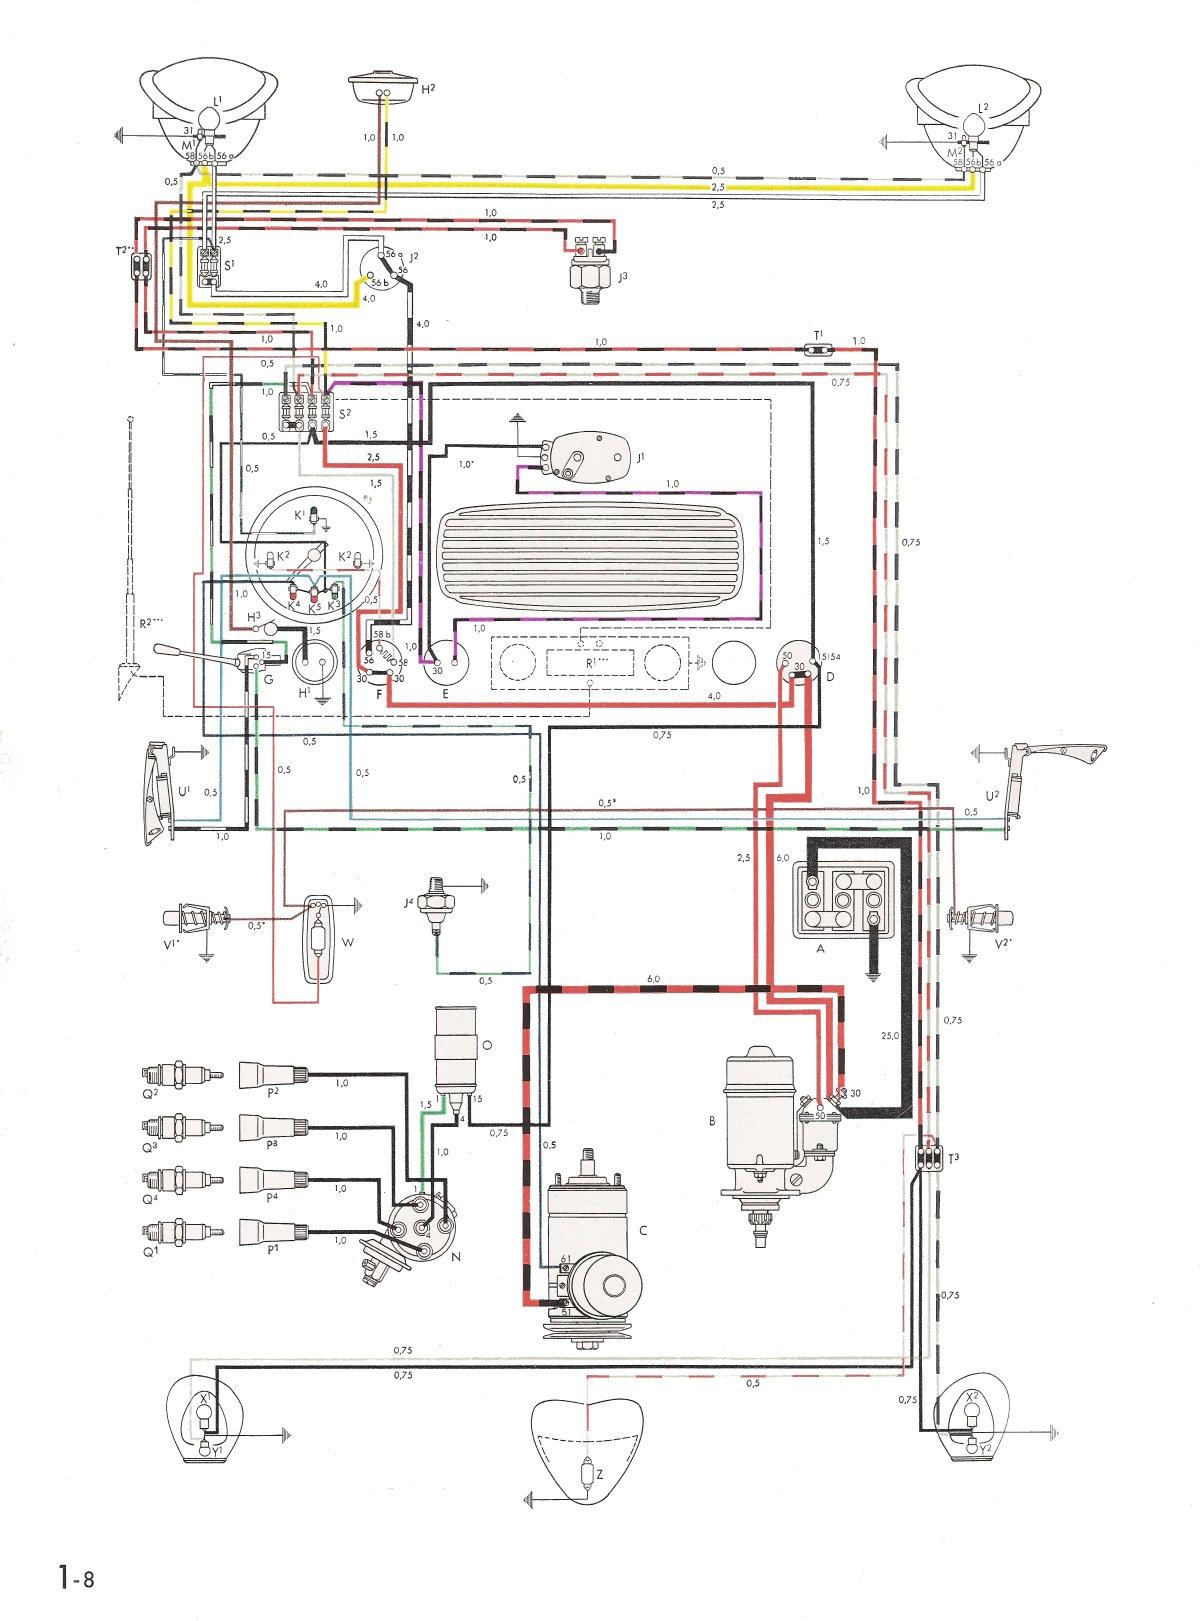 bug54?resize\\\\\\\=665%2C898\\\\\\\&ssl\\\\\\\=1 jvc kd s36 wiring diagram wiring diagrams Volvo Penta Marine Engines at reclaimingppi.co